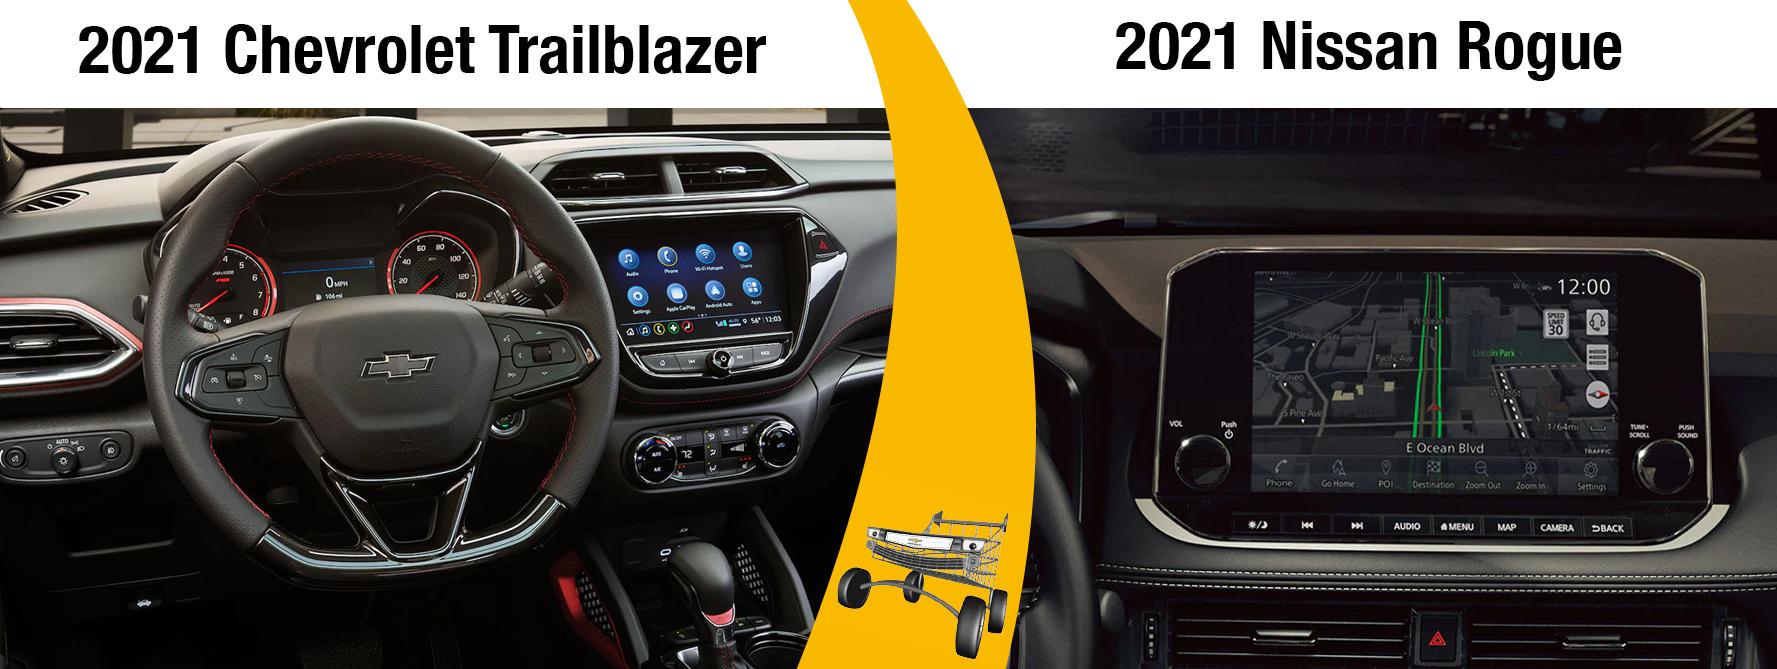 2021 Trailblazer vs 2021 Nissan Rogue Safety Features